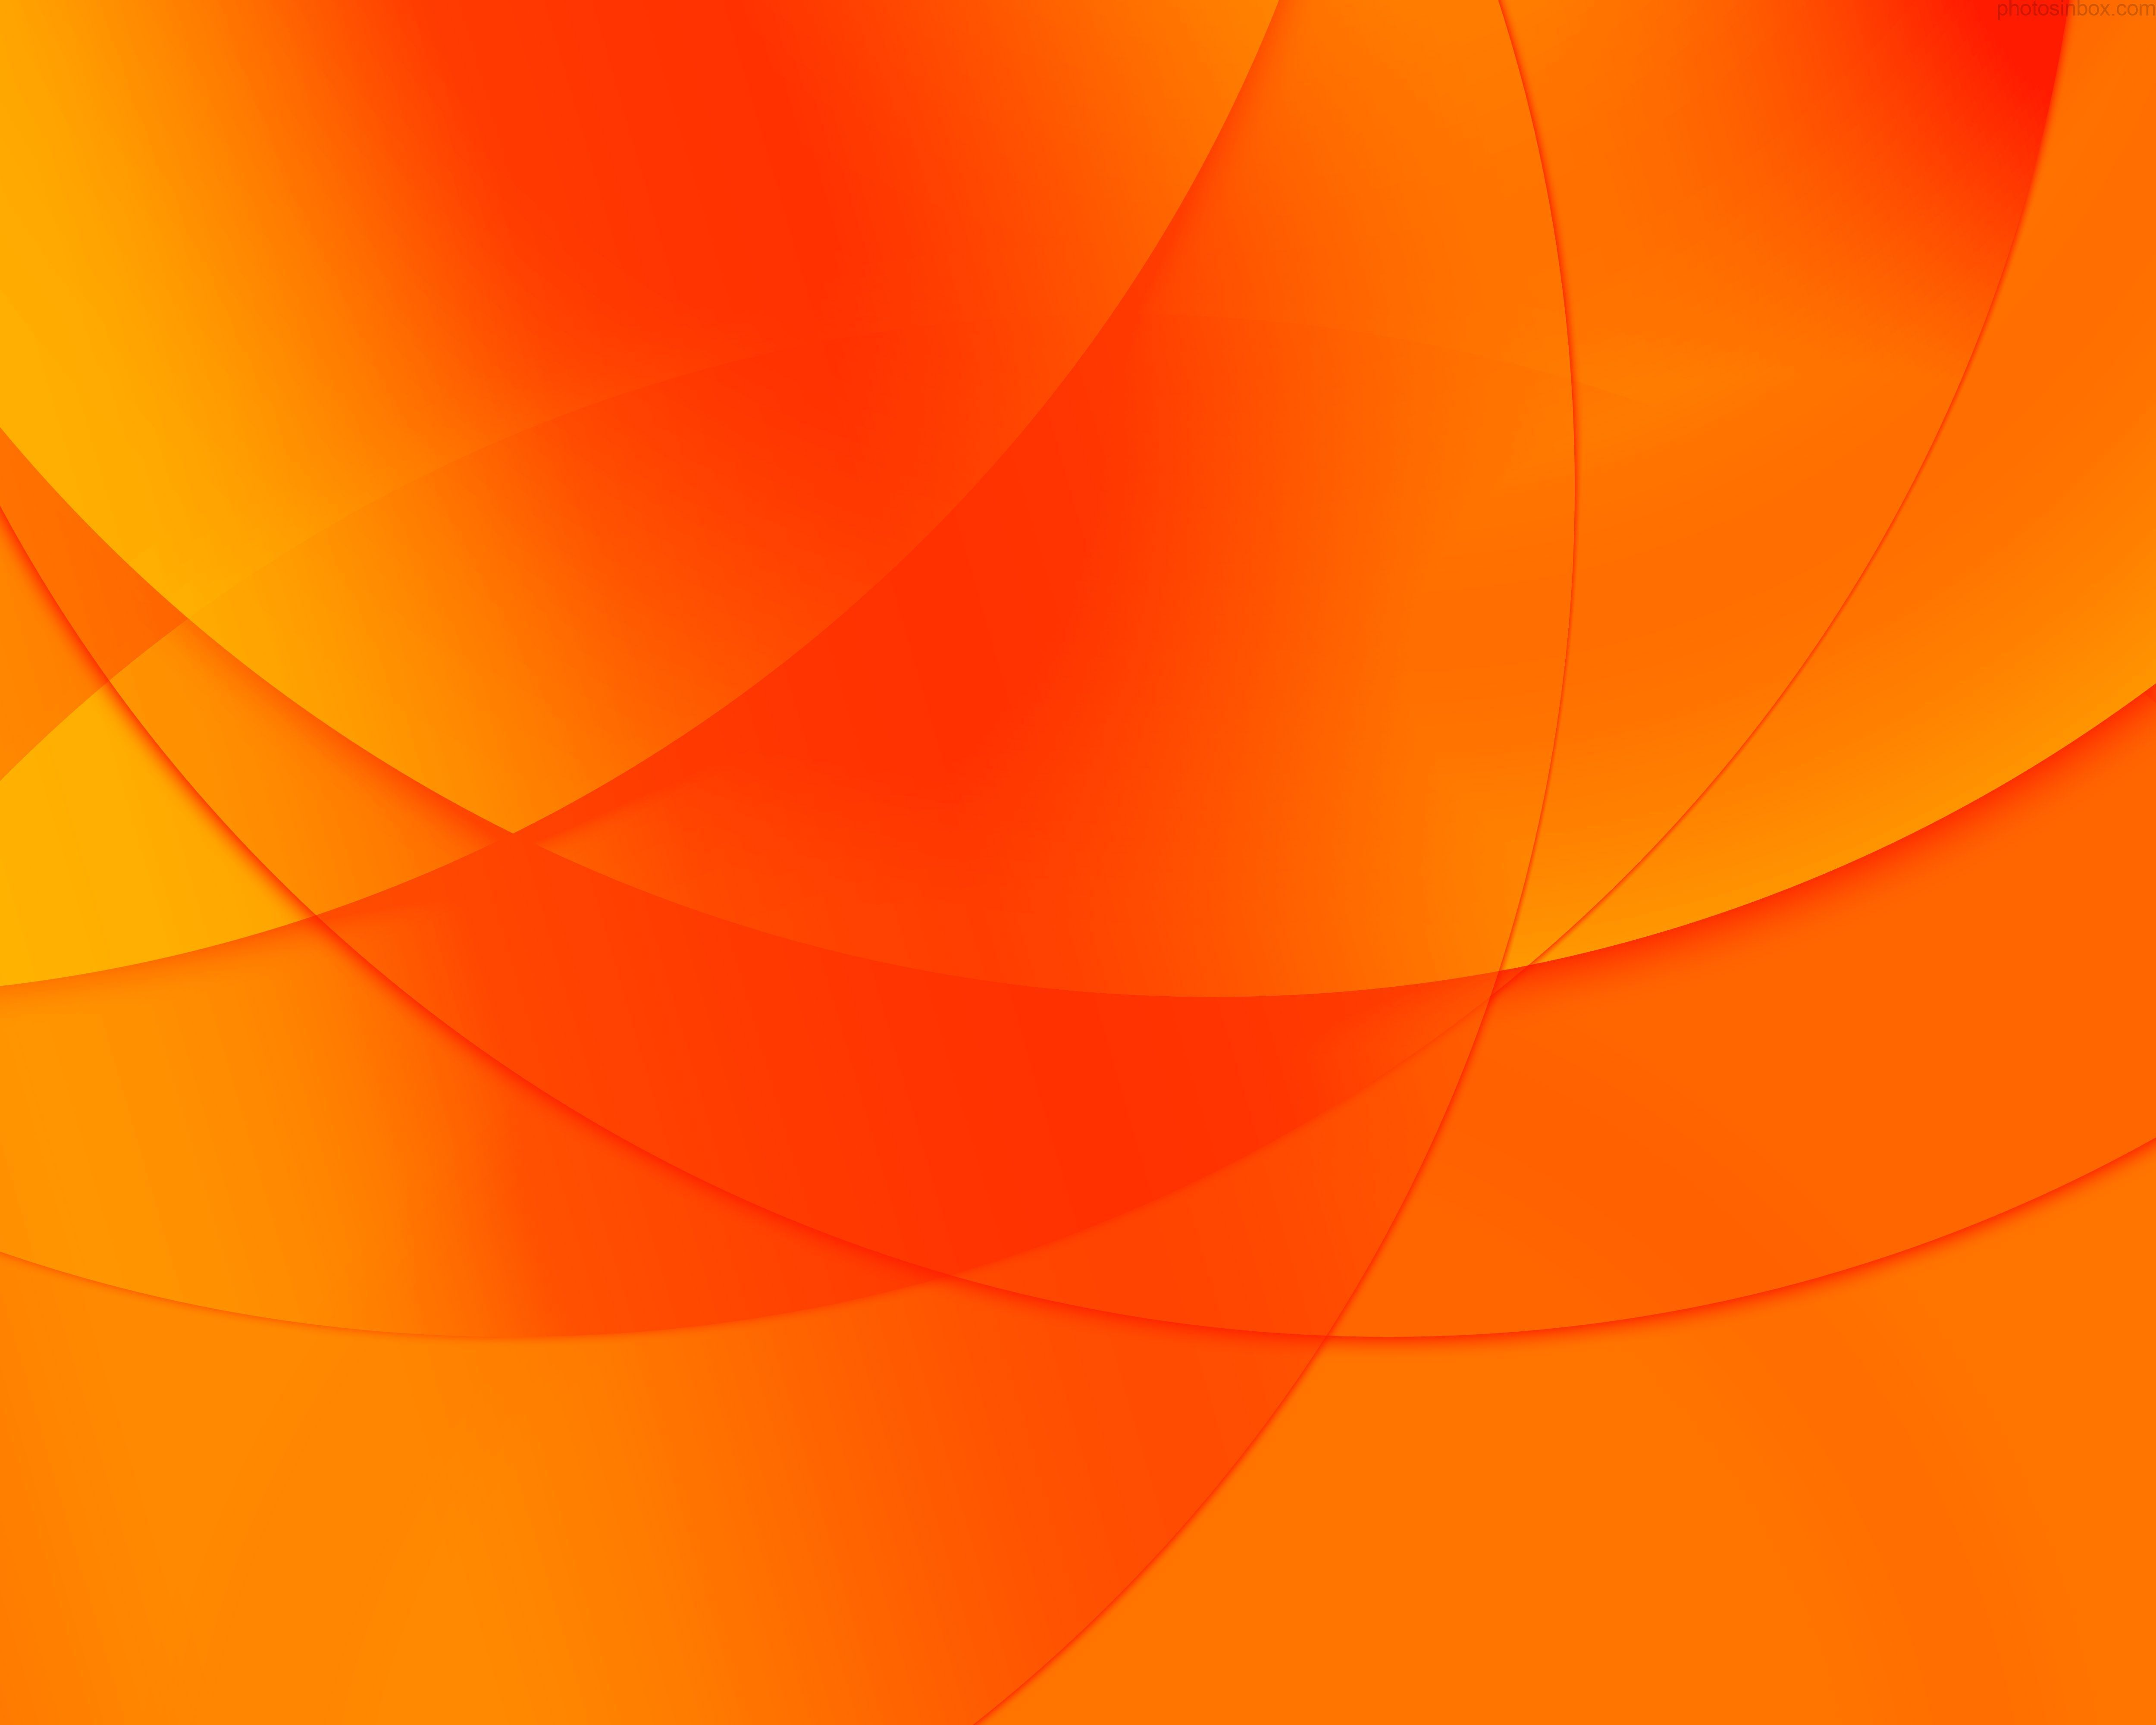 Solid Orange Wallpaper HQ Definition Desktop Photos